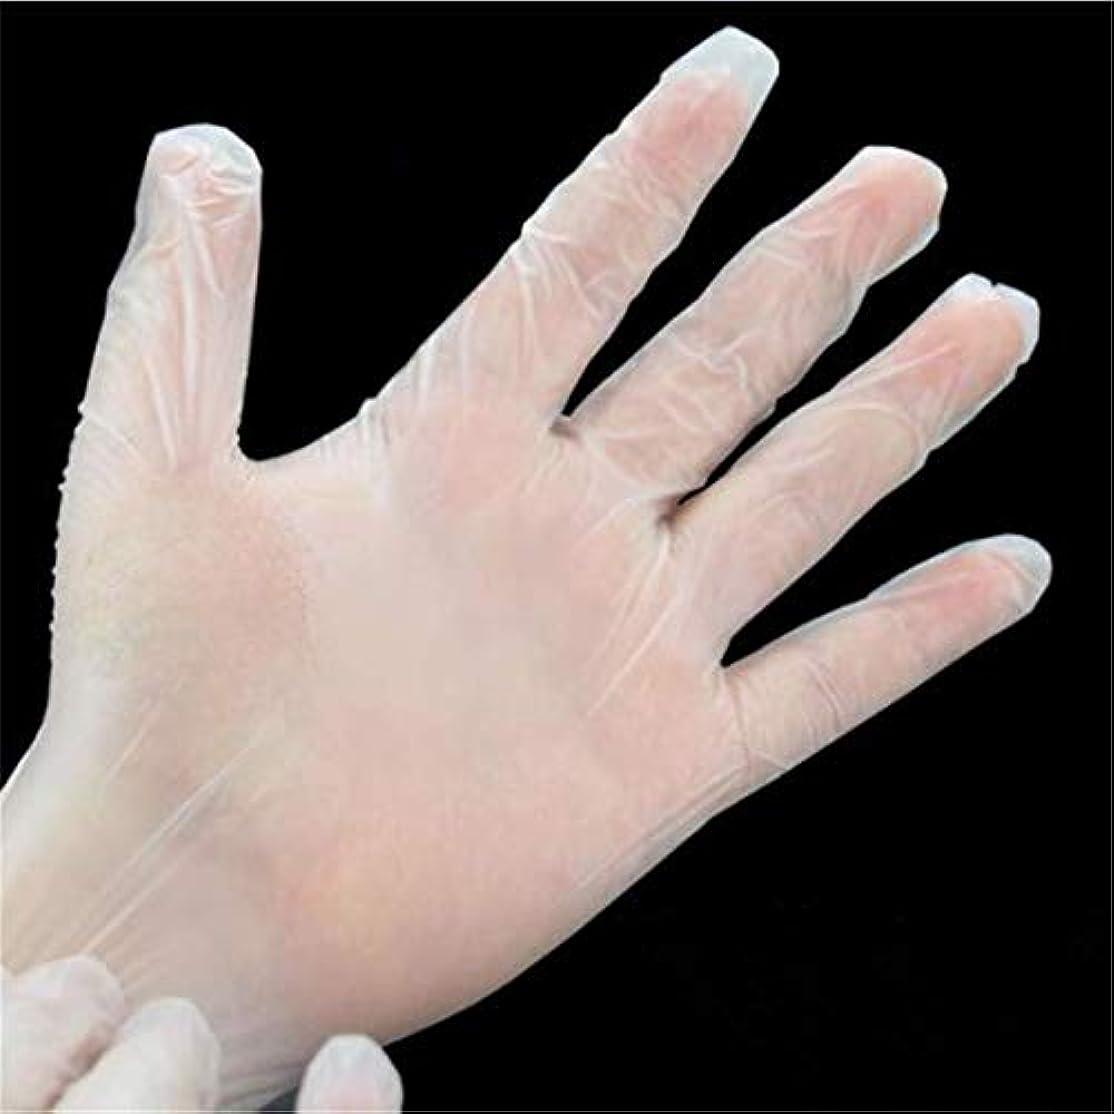 kaiwuyu 使い捨て手袋 ポリエチレン手袋 極薄ビニール手袋 ポリエチレン 透明 実用 衛生 50枚 高質